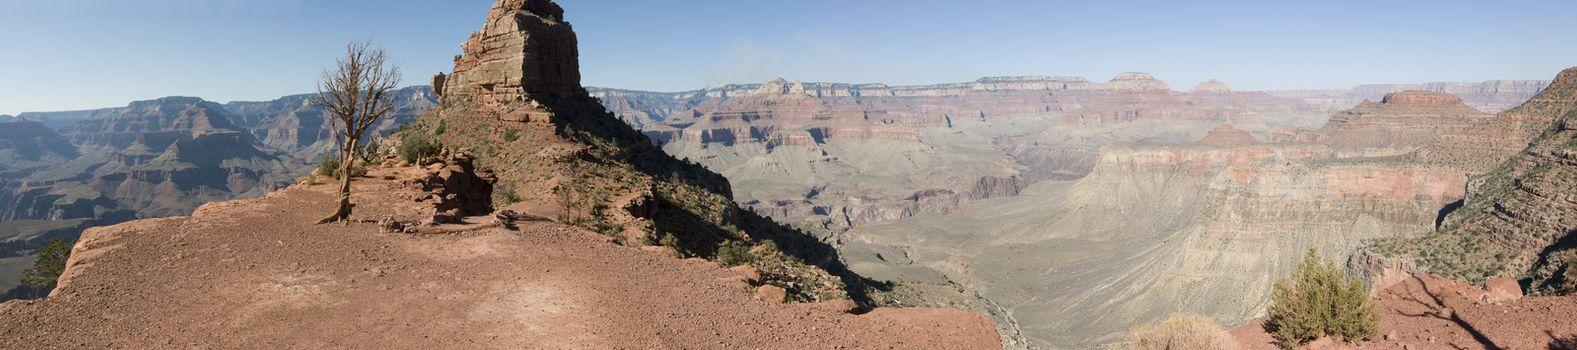 South Kaibob Trail panorama in Grand Canyon National Park, AZ